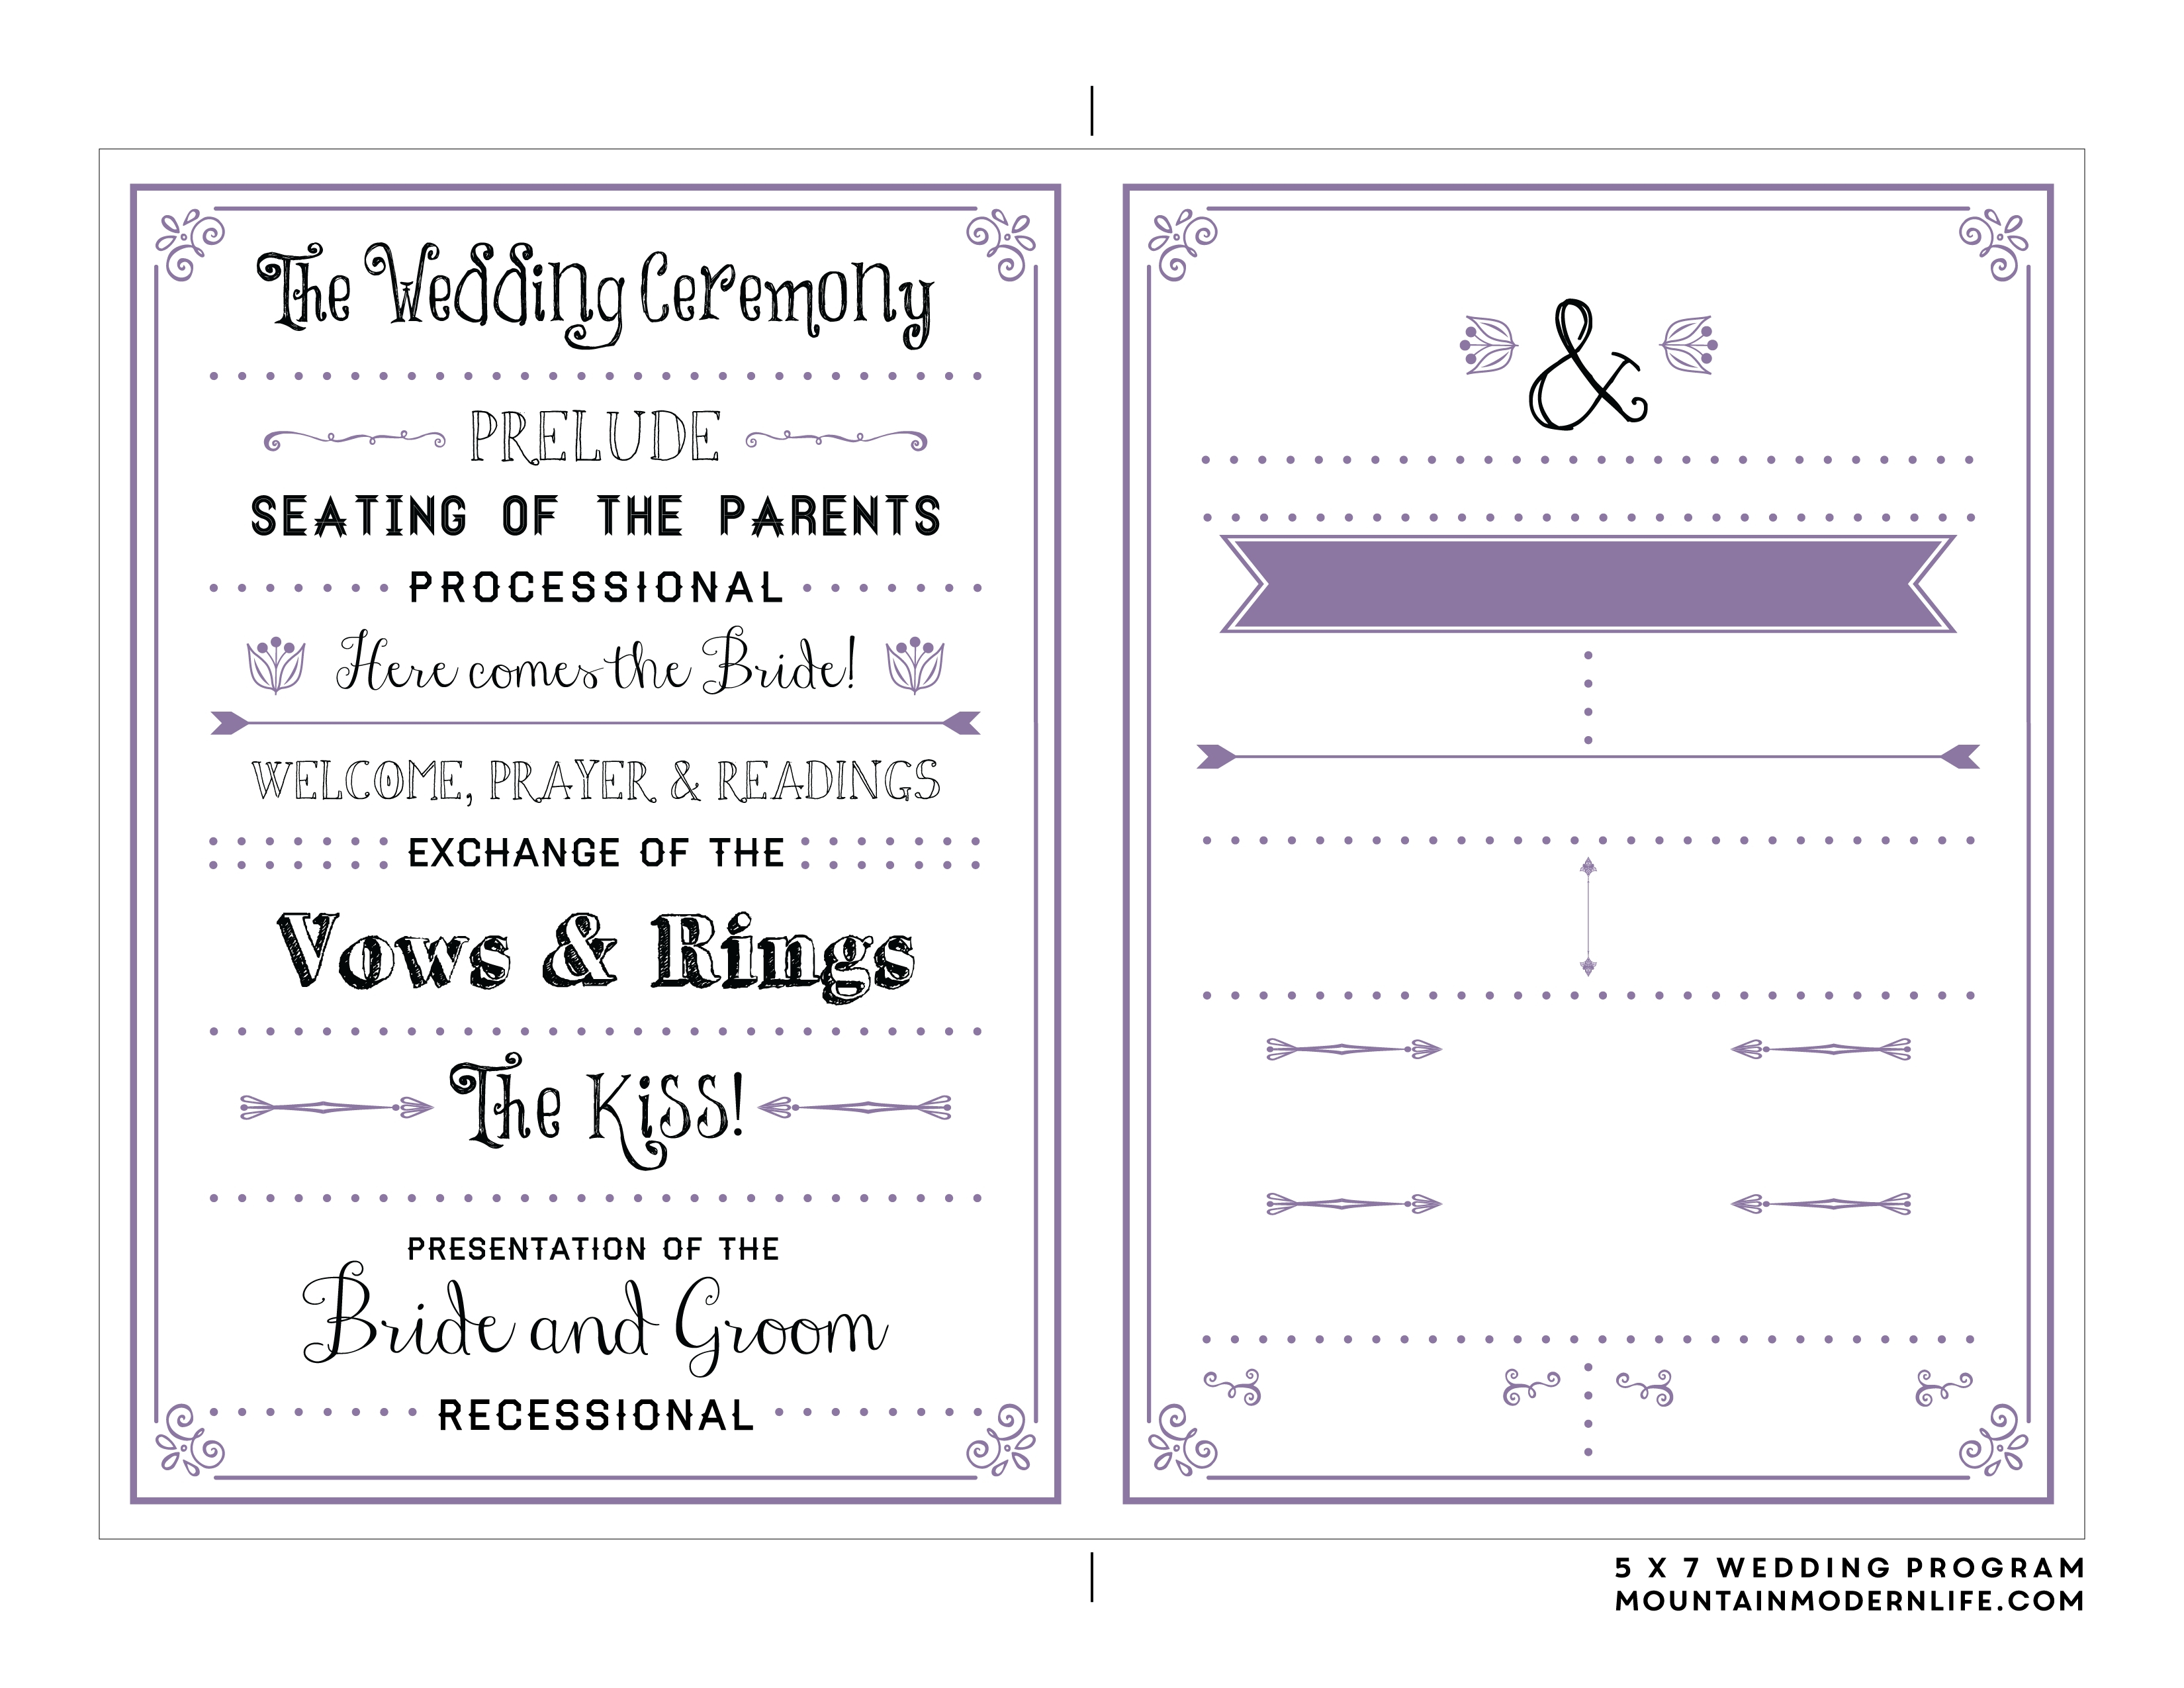 Free Printable Wedding Program Templates | Bestprintable231118 - Free Printable Wedding Programs